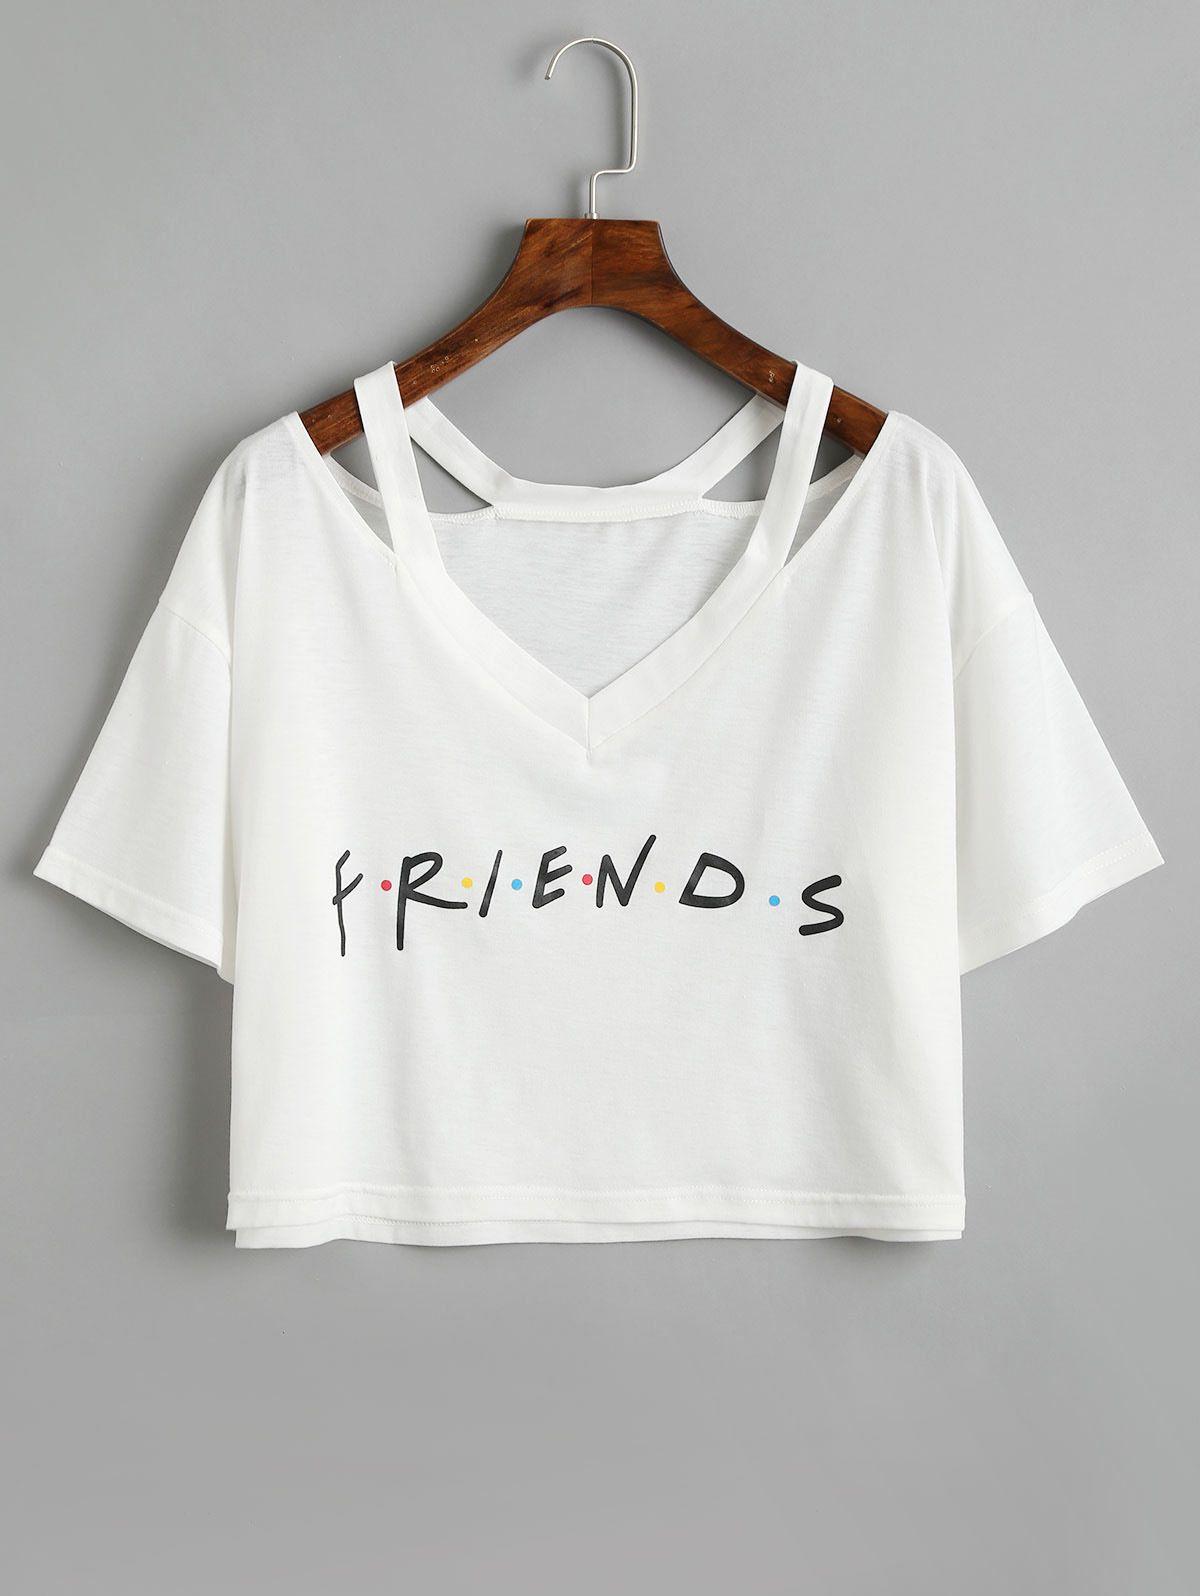 fc8c320a8a 2019 Friends Women Crop Tops Tee Shirt White Summer Short Sleeve Clothes  Bandage Blouses   Shirts Femme 2018WS6422U From Bibei03